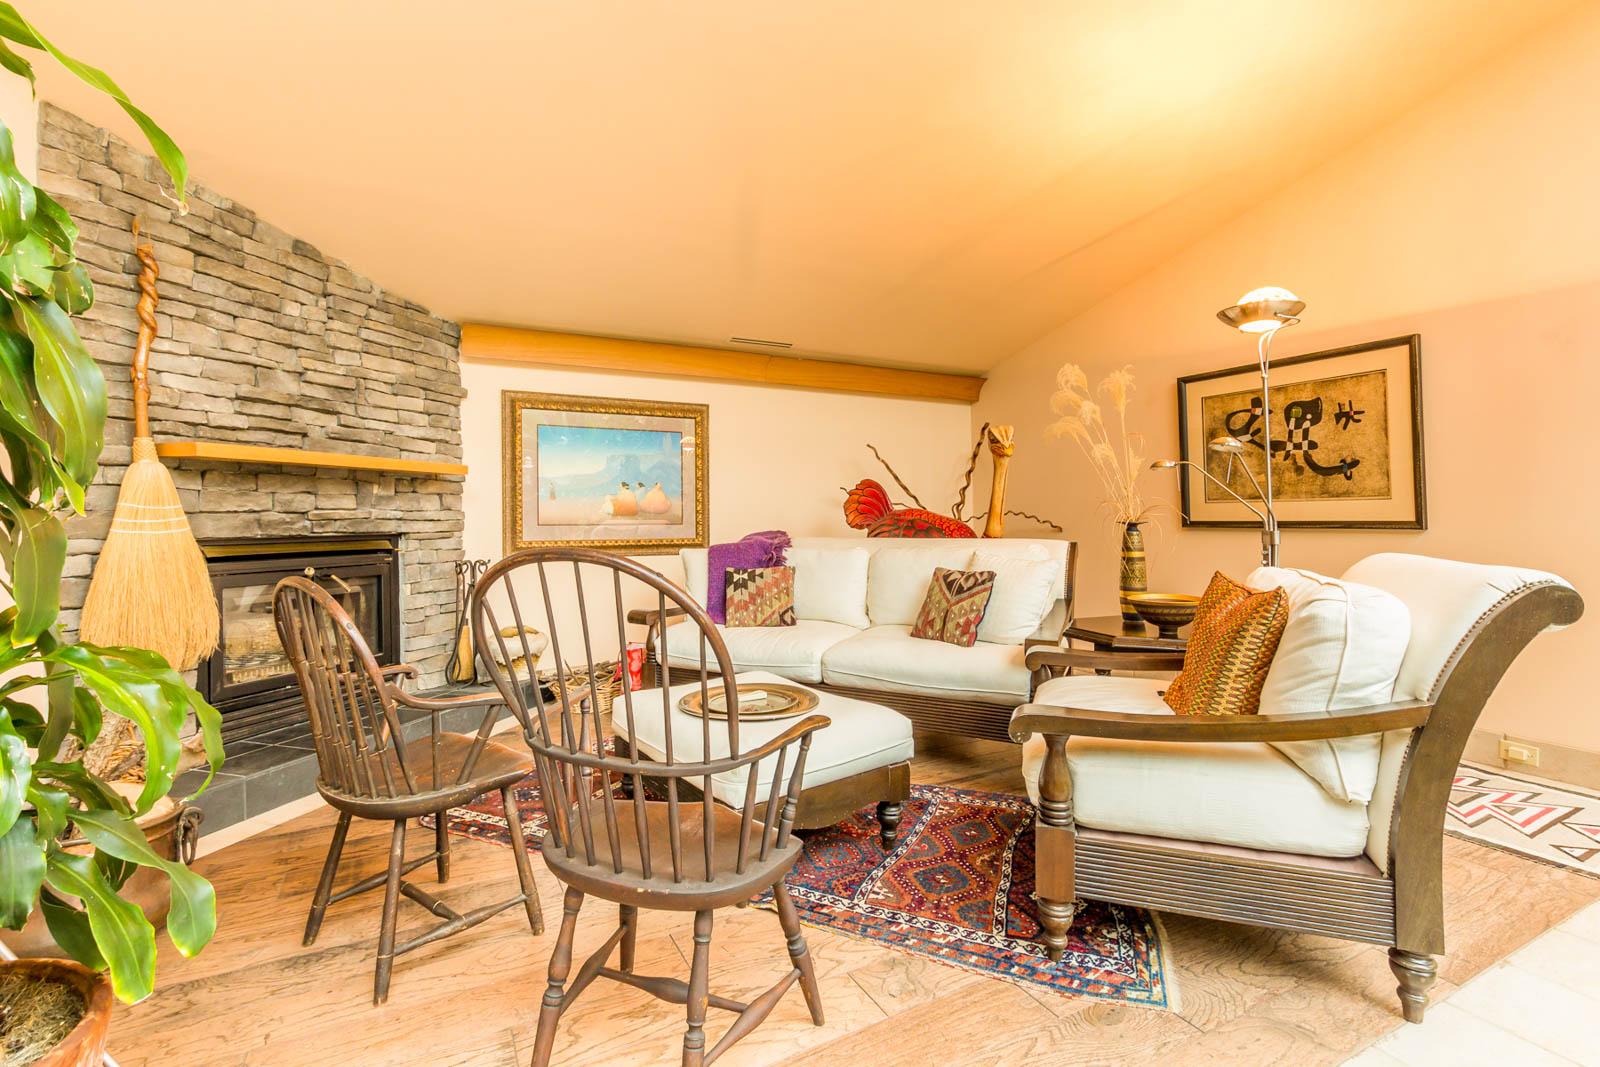 Additional photo for property listing at GARDEN ATRIUM 4 GARDEN ATRIUM WAY Poquoson, Virginia 23662 United States